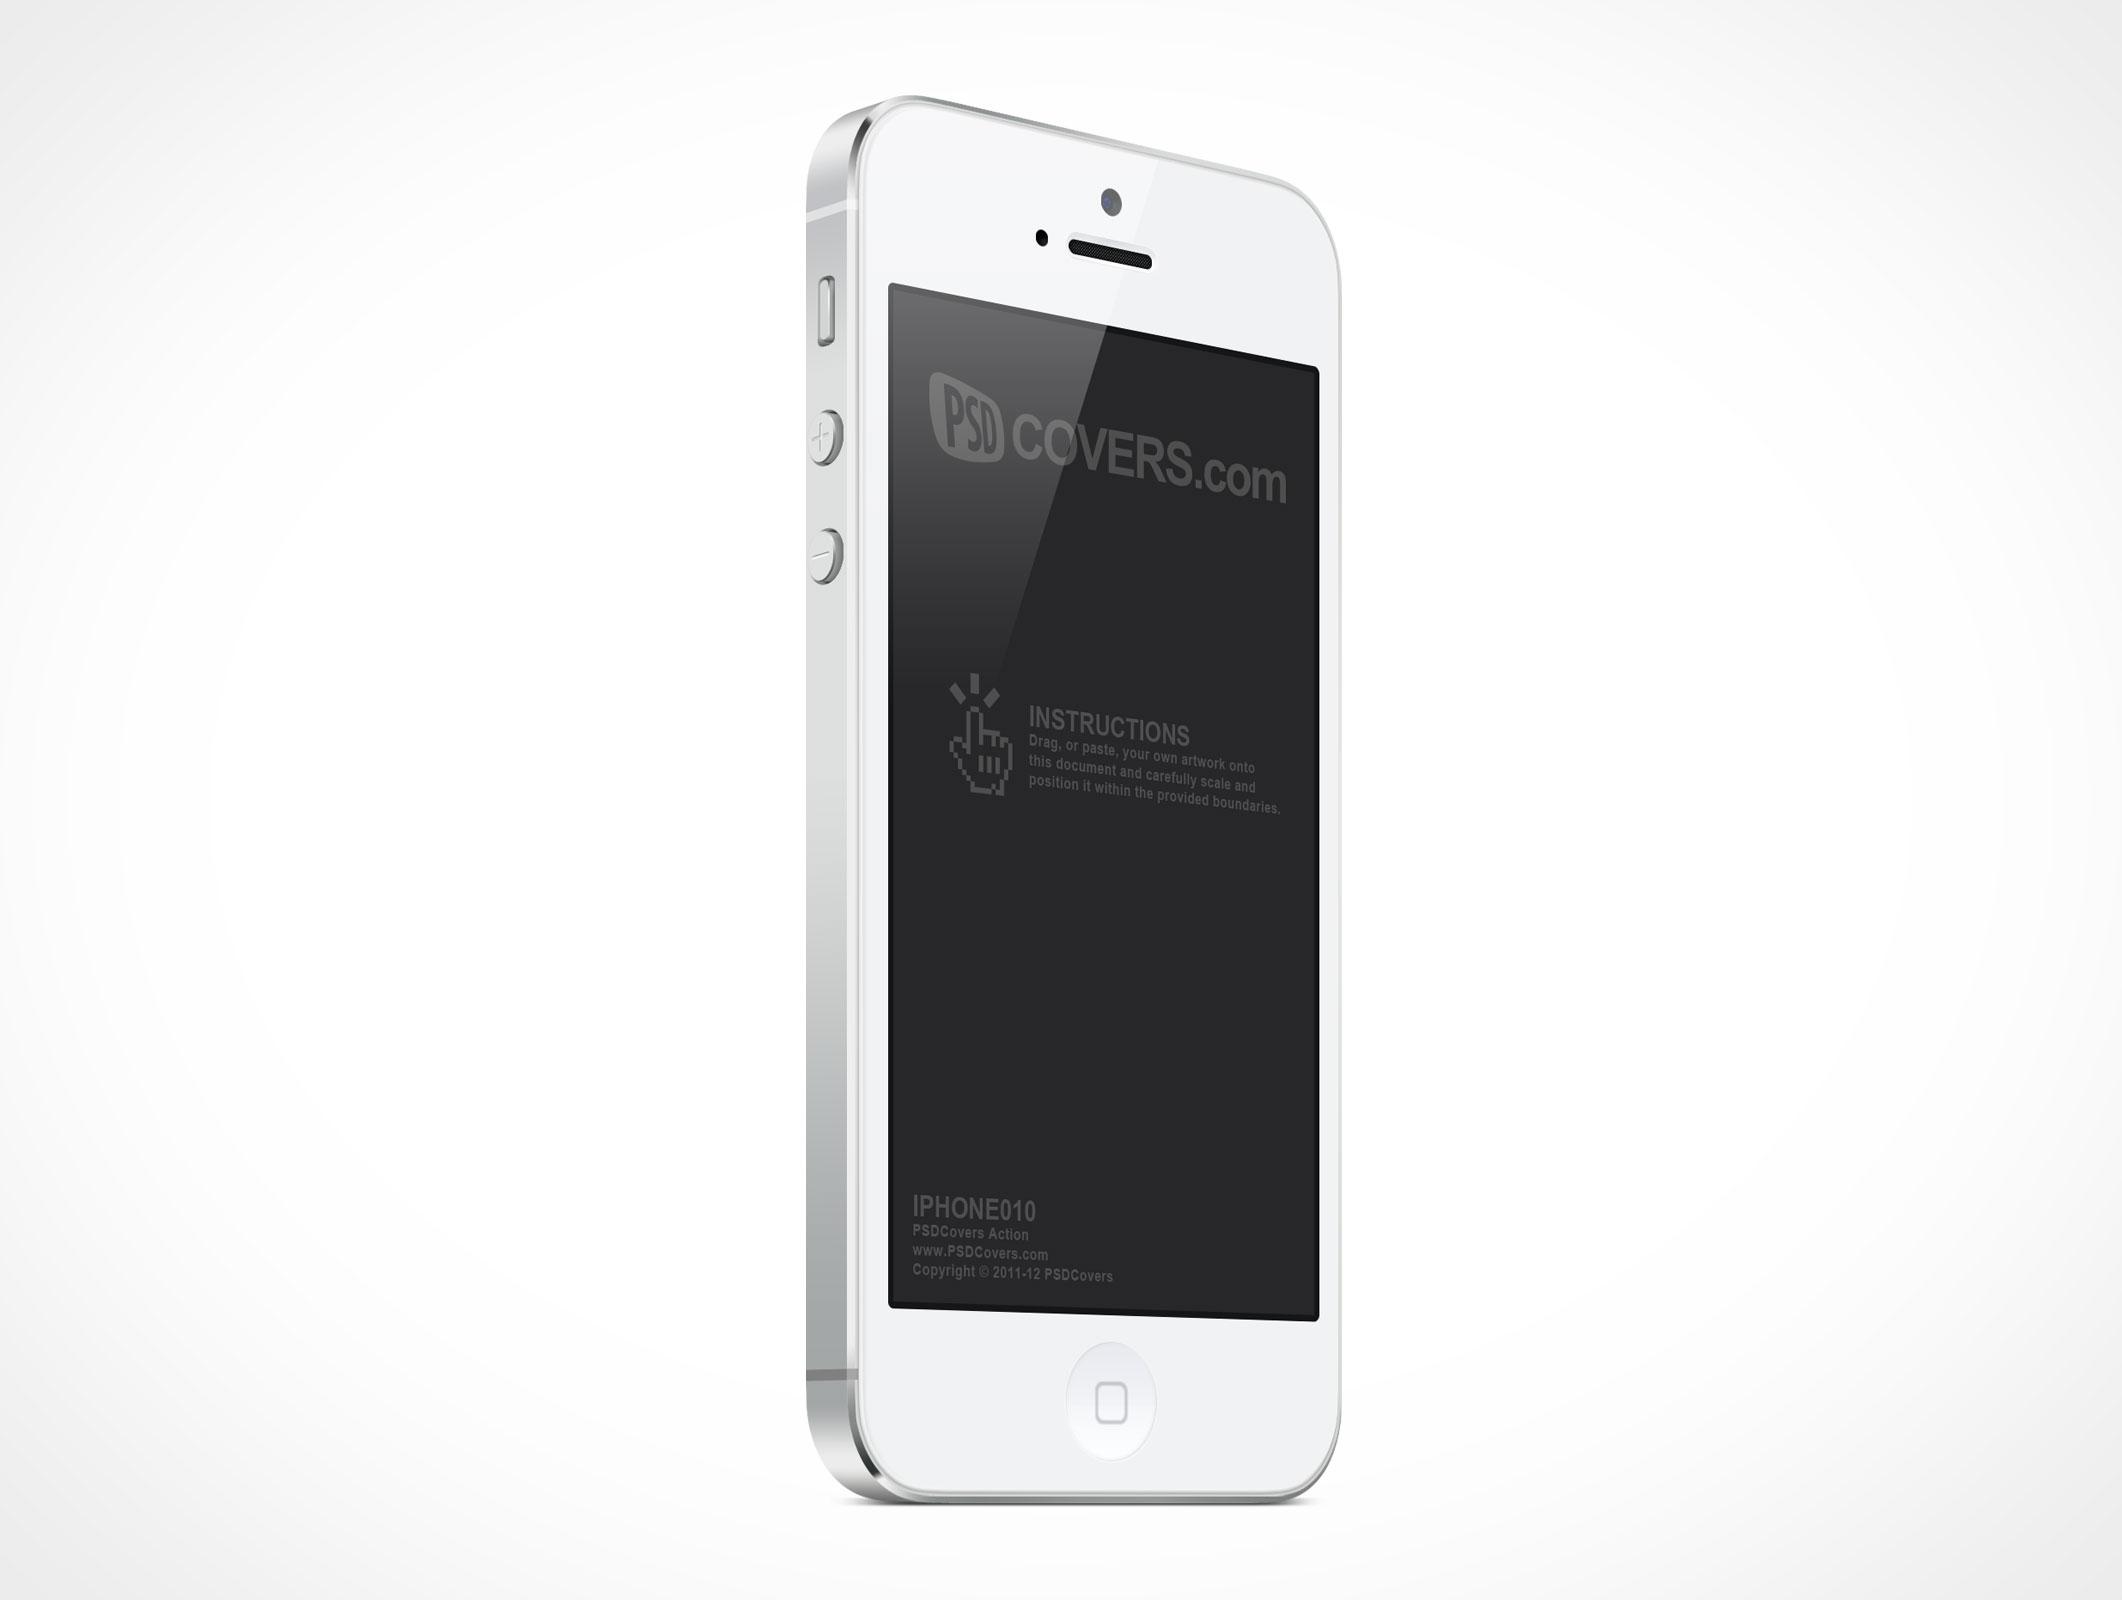 IPHONE010